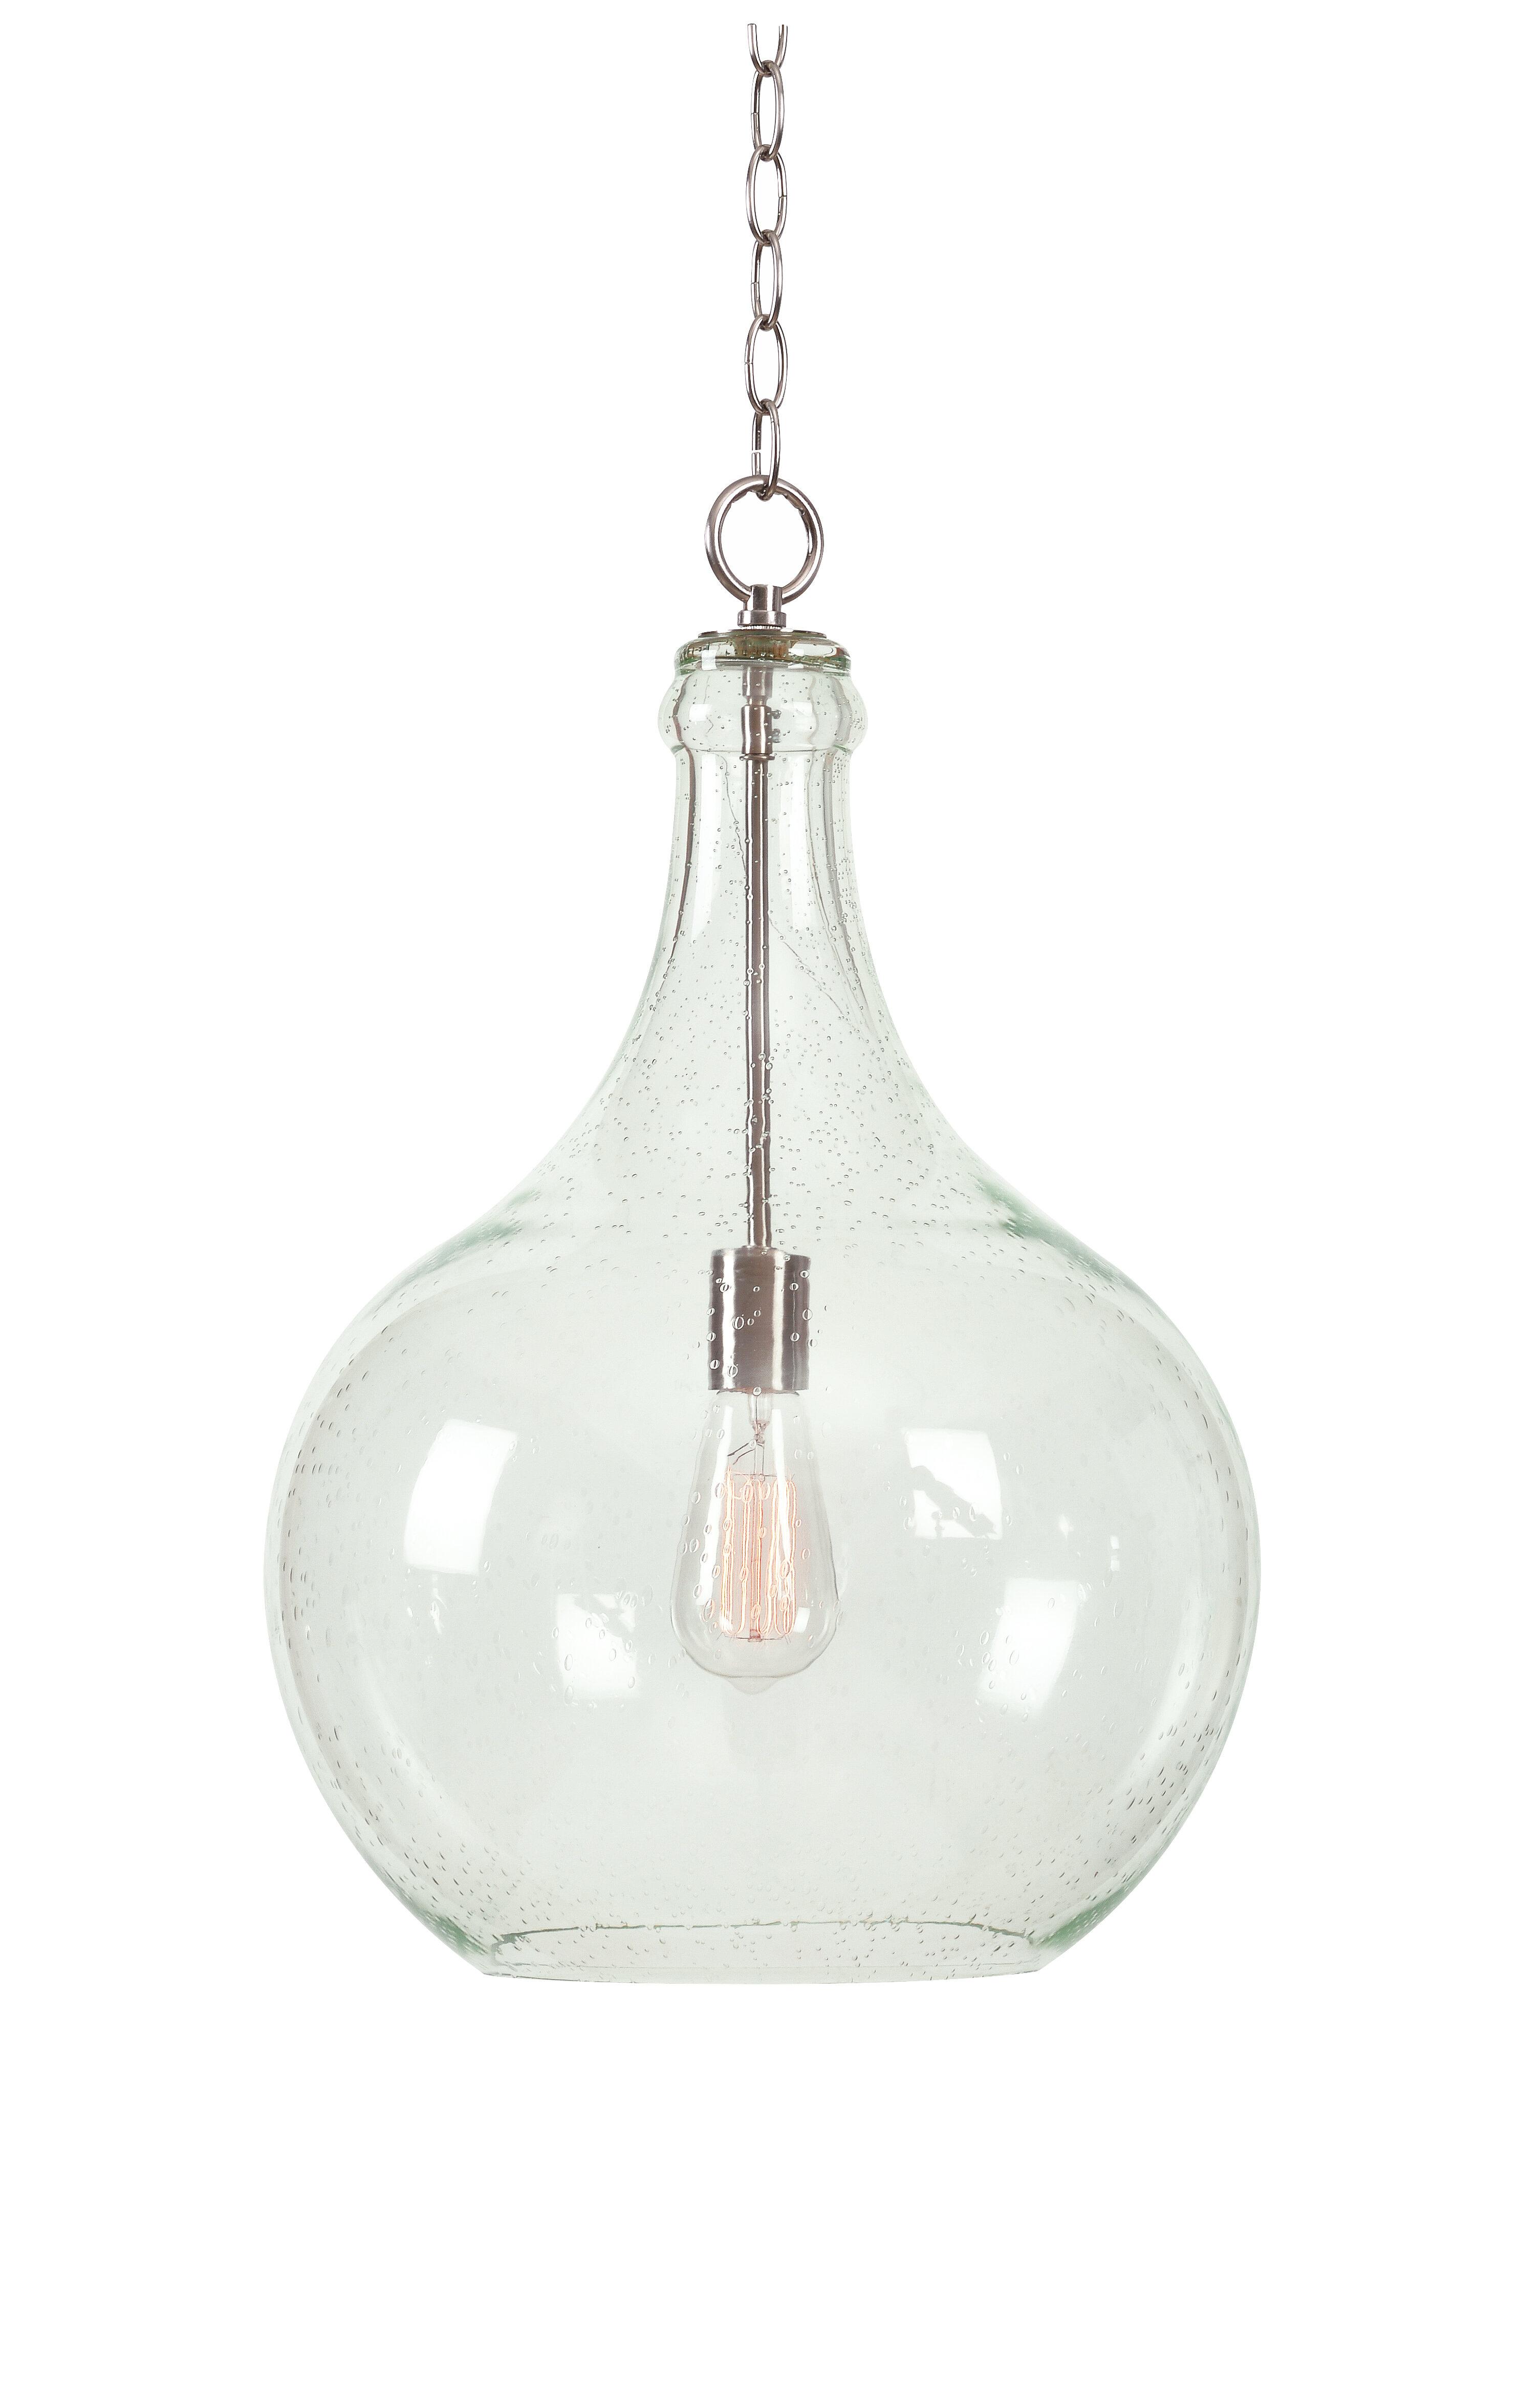 Brayden Studio Bustillos 1 Light Single Globe Pendant With Scruggs 1 Light Geometric Pendants (View 3 of 30)